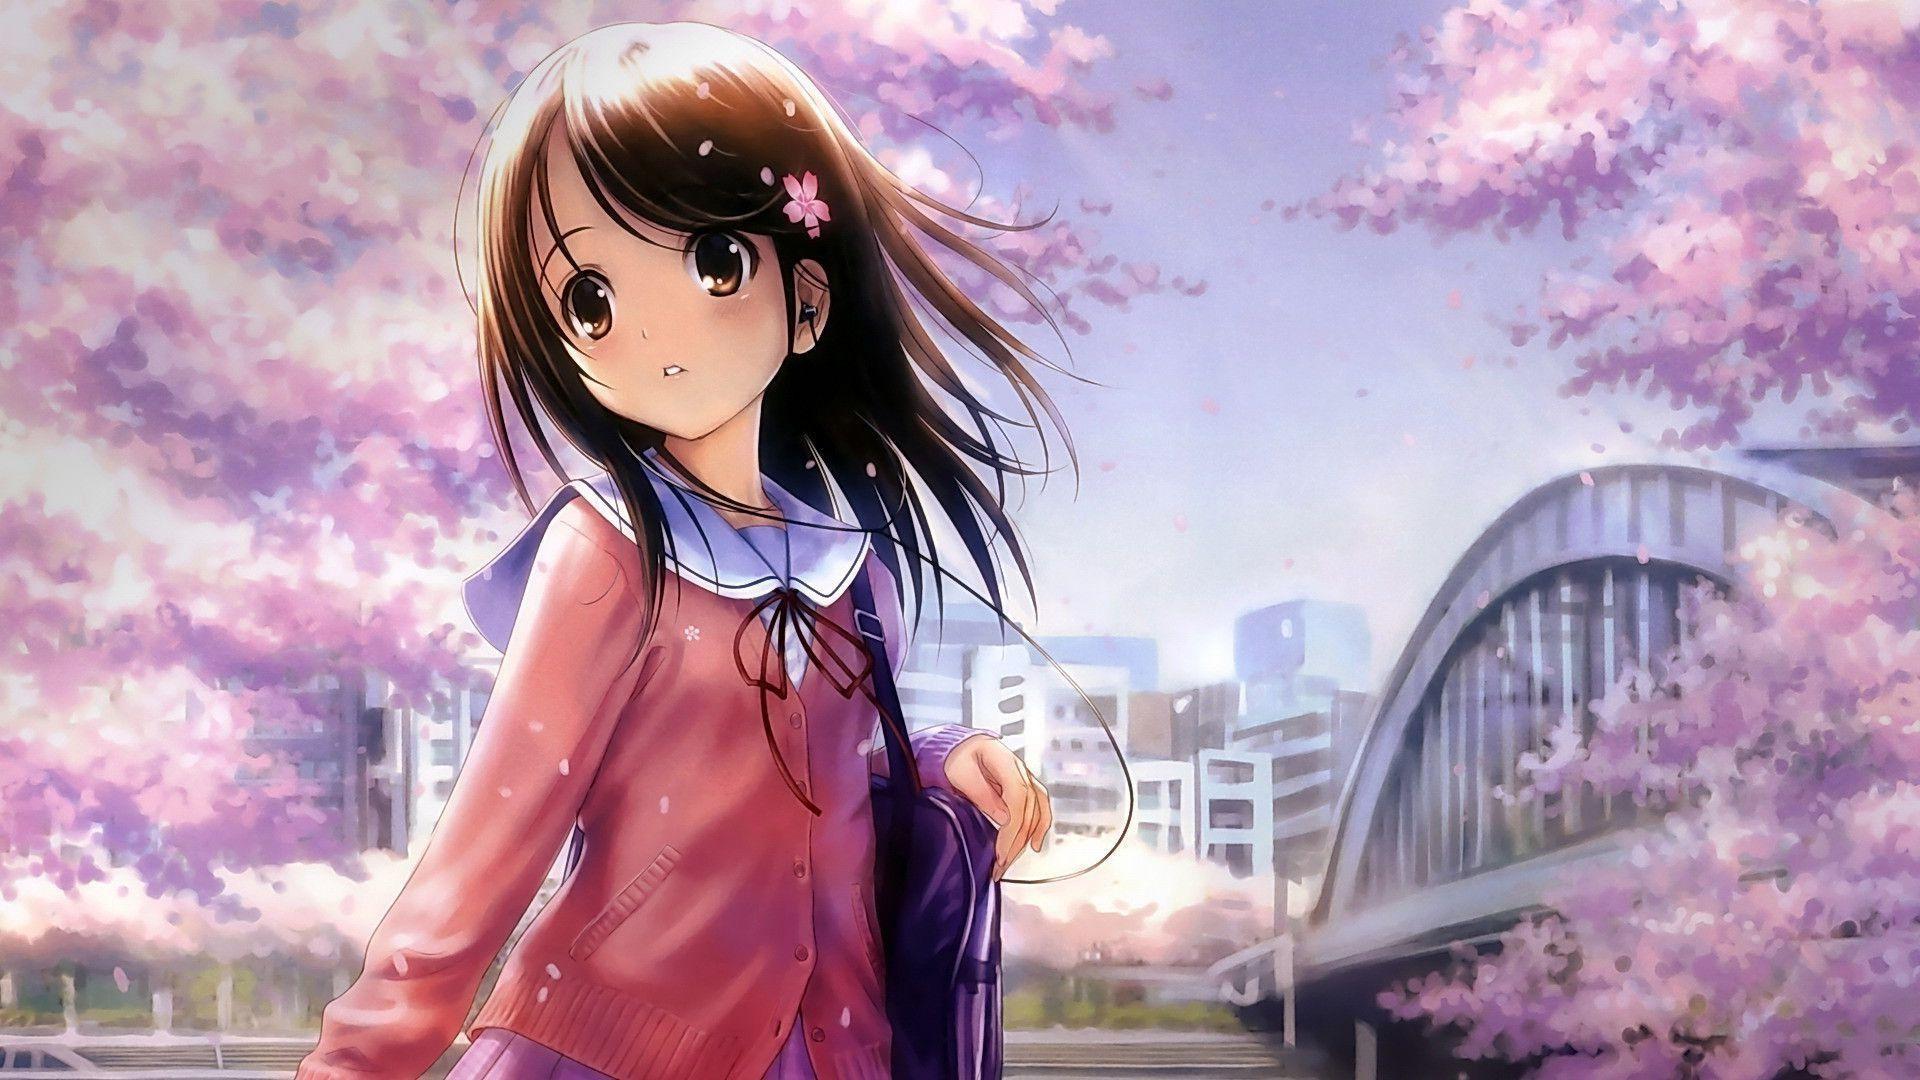 HD Anime Wallpapers 1080p | amxxcs.ru